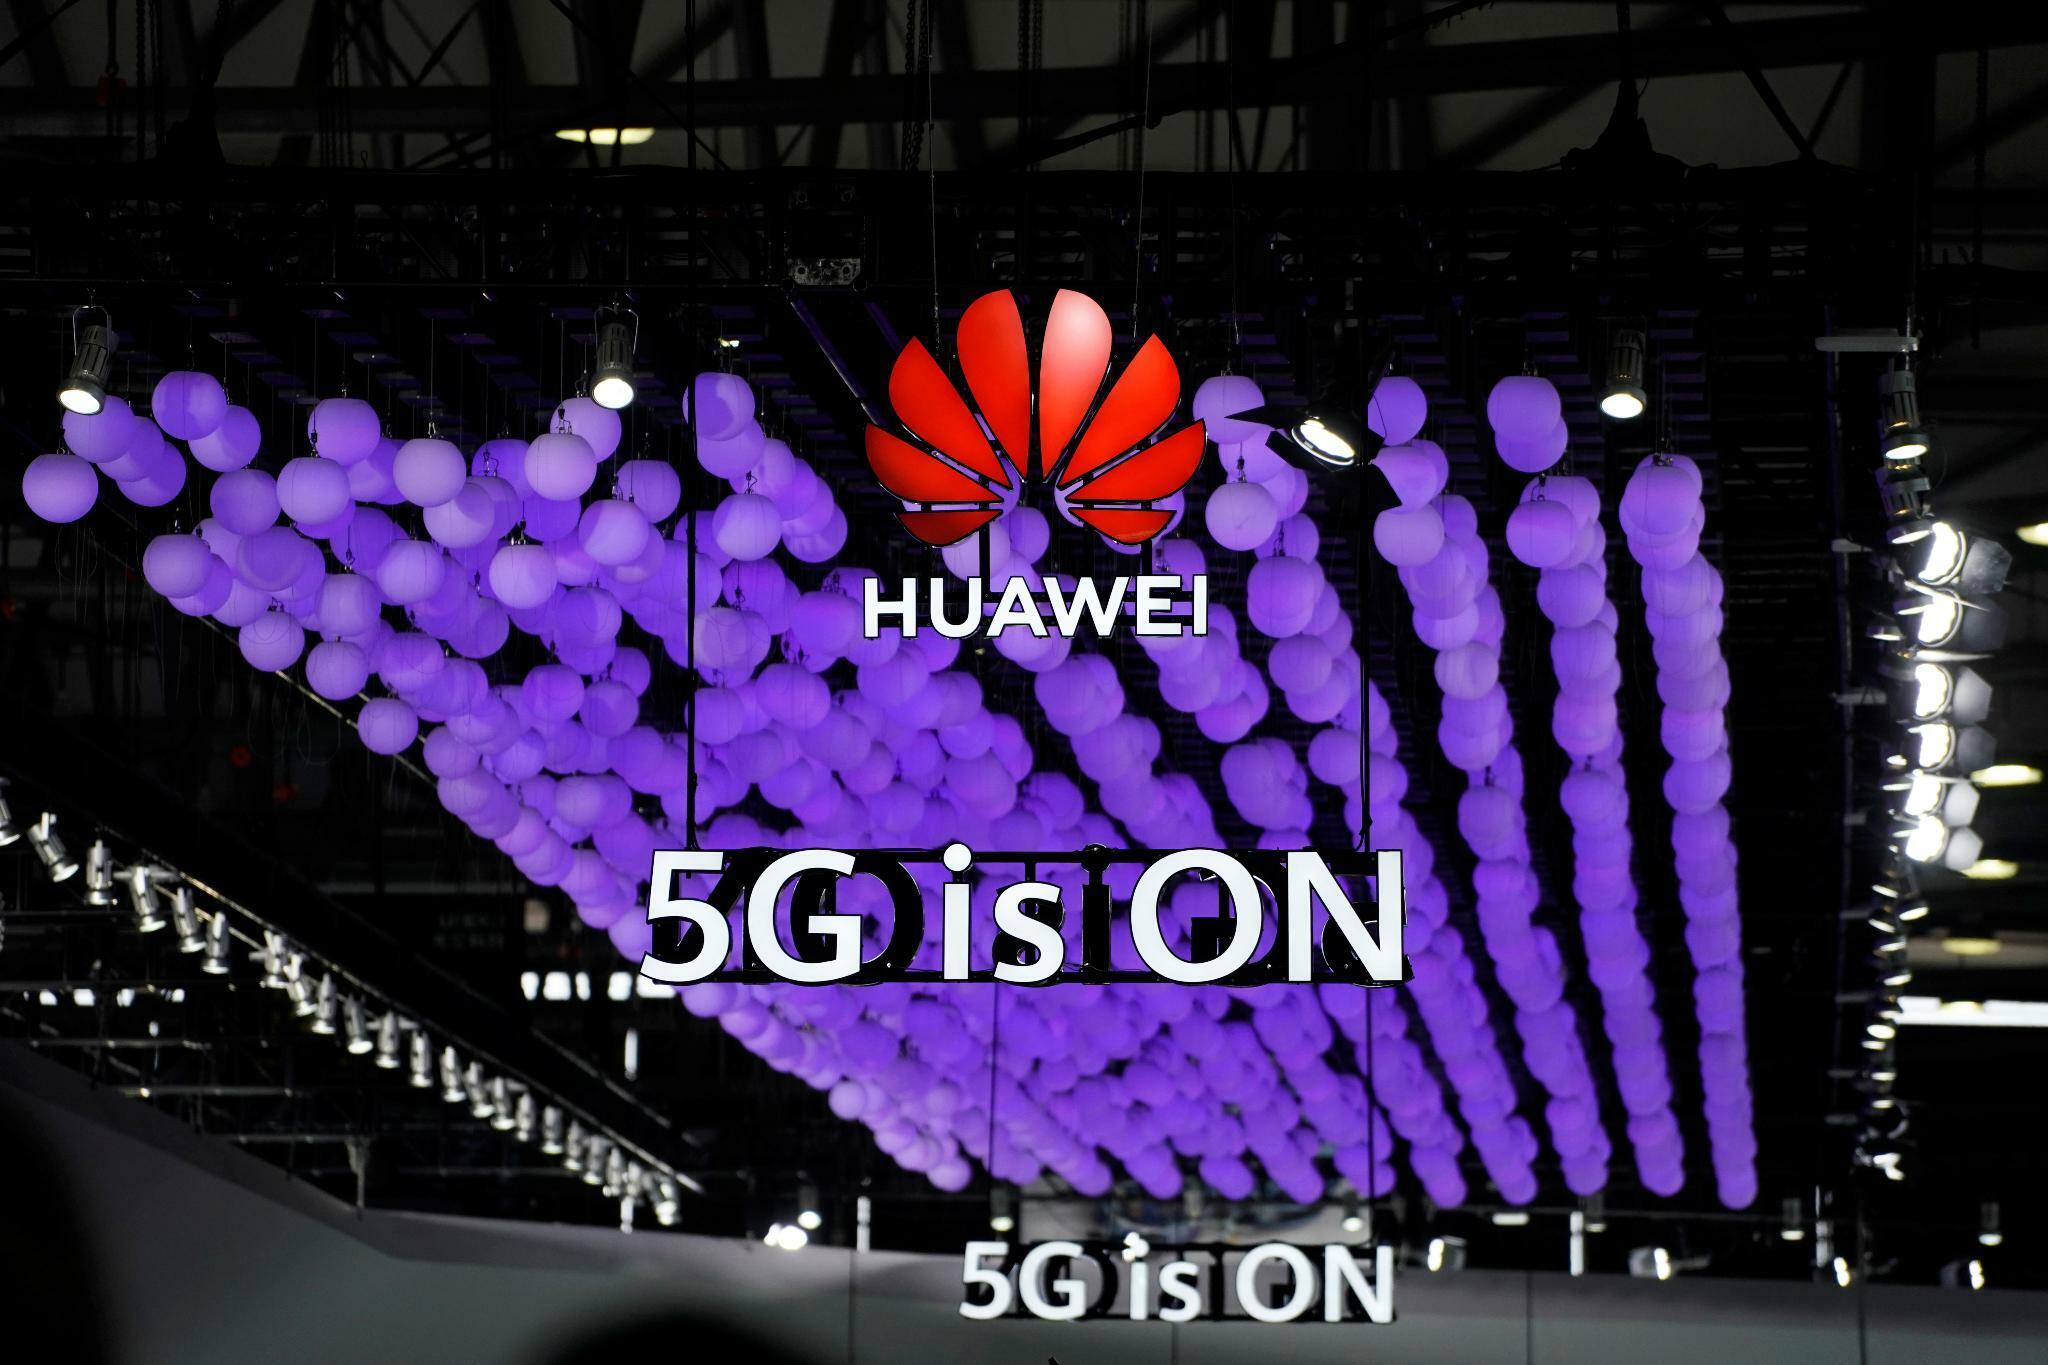 Netzwerkausbau: Familienunternehmer zweifeln an Huawei